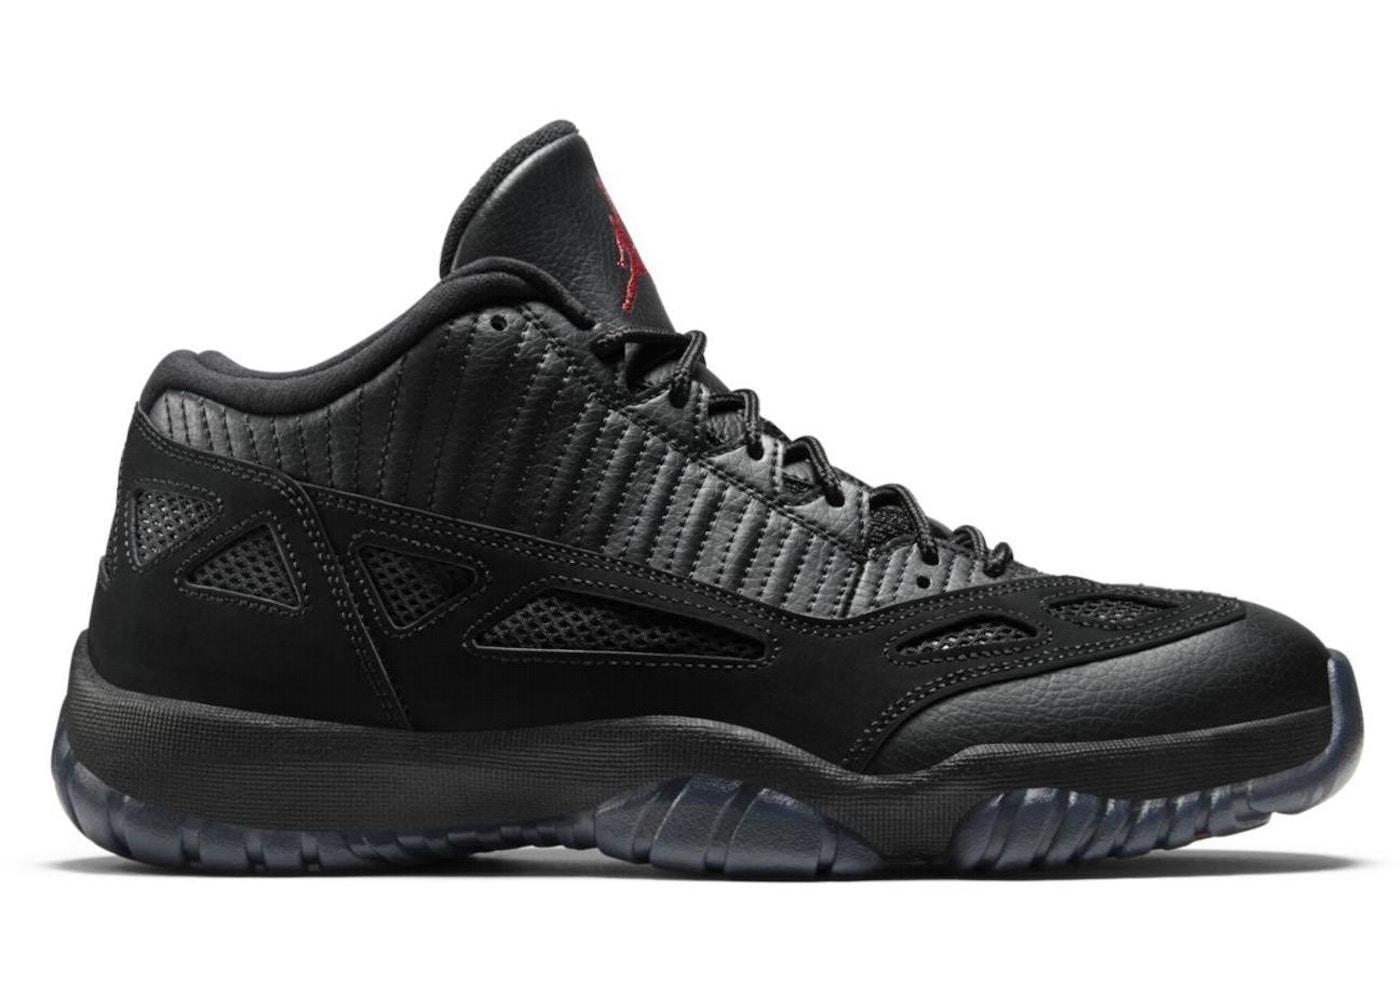 newest e0c5f 93fcb Buy Air Jordan 11 Size 17 Shoes   Deadstock Sneakers